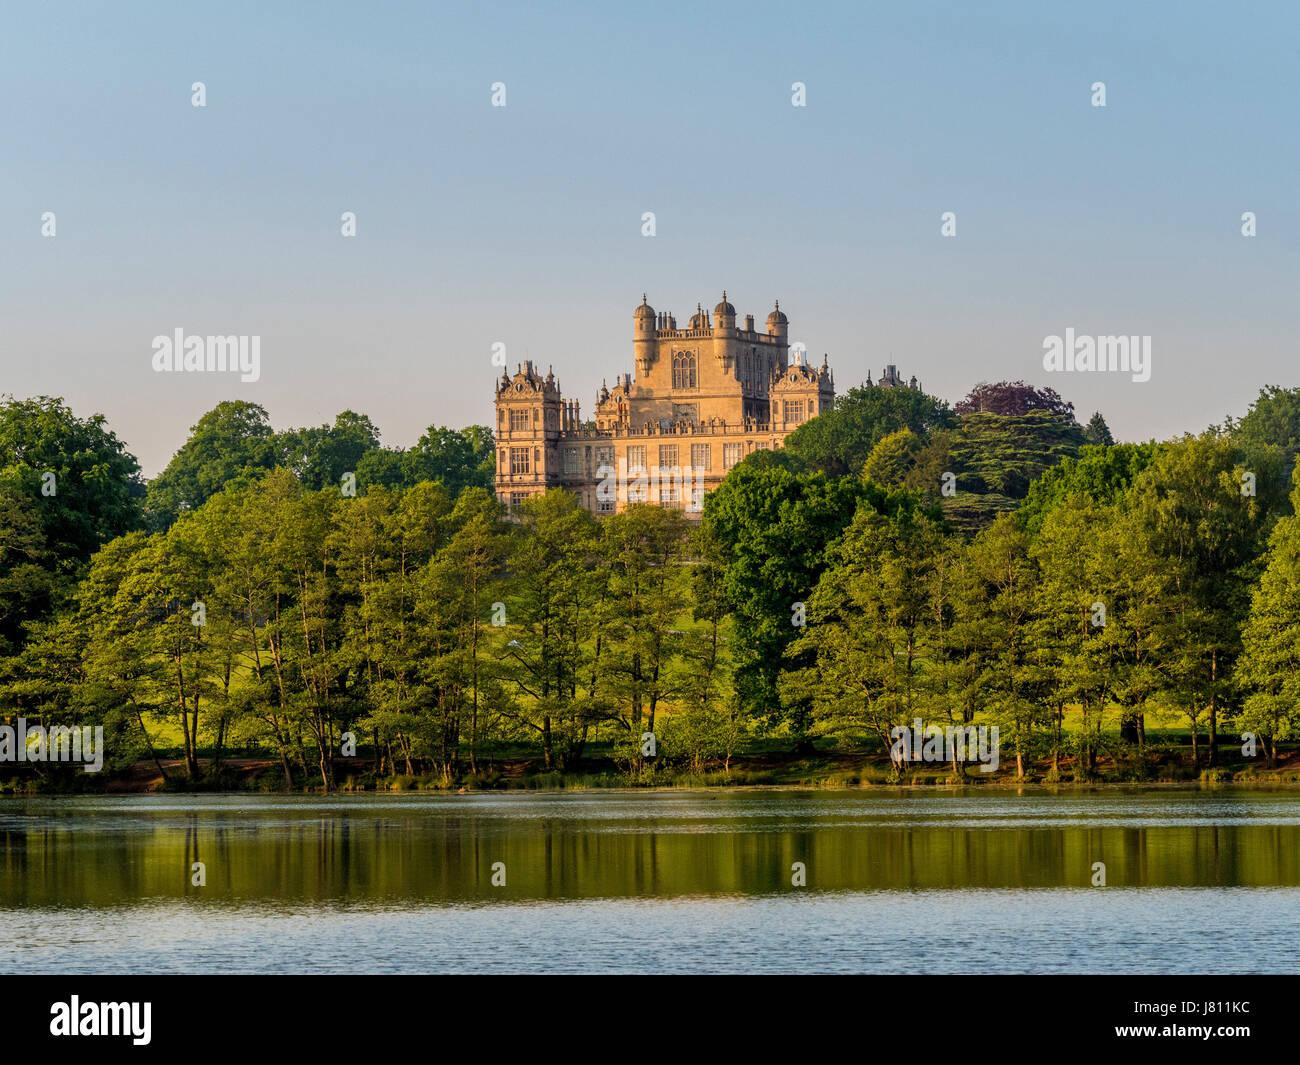 Lake and Wollaton Hall, Wollaton Park, Nottingham, UK. - Stock Image